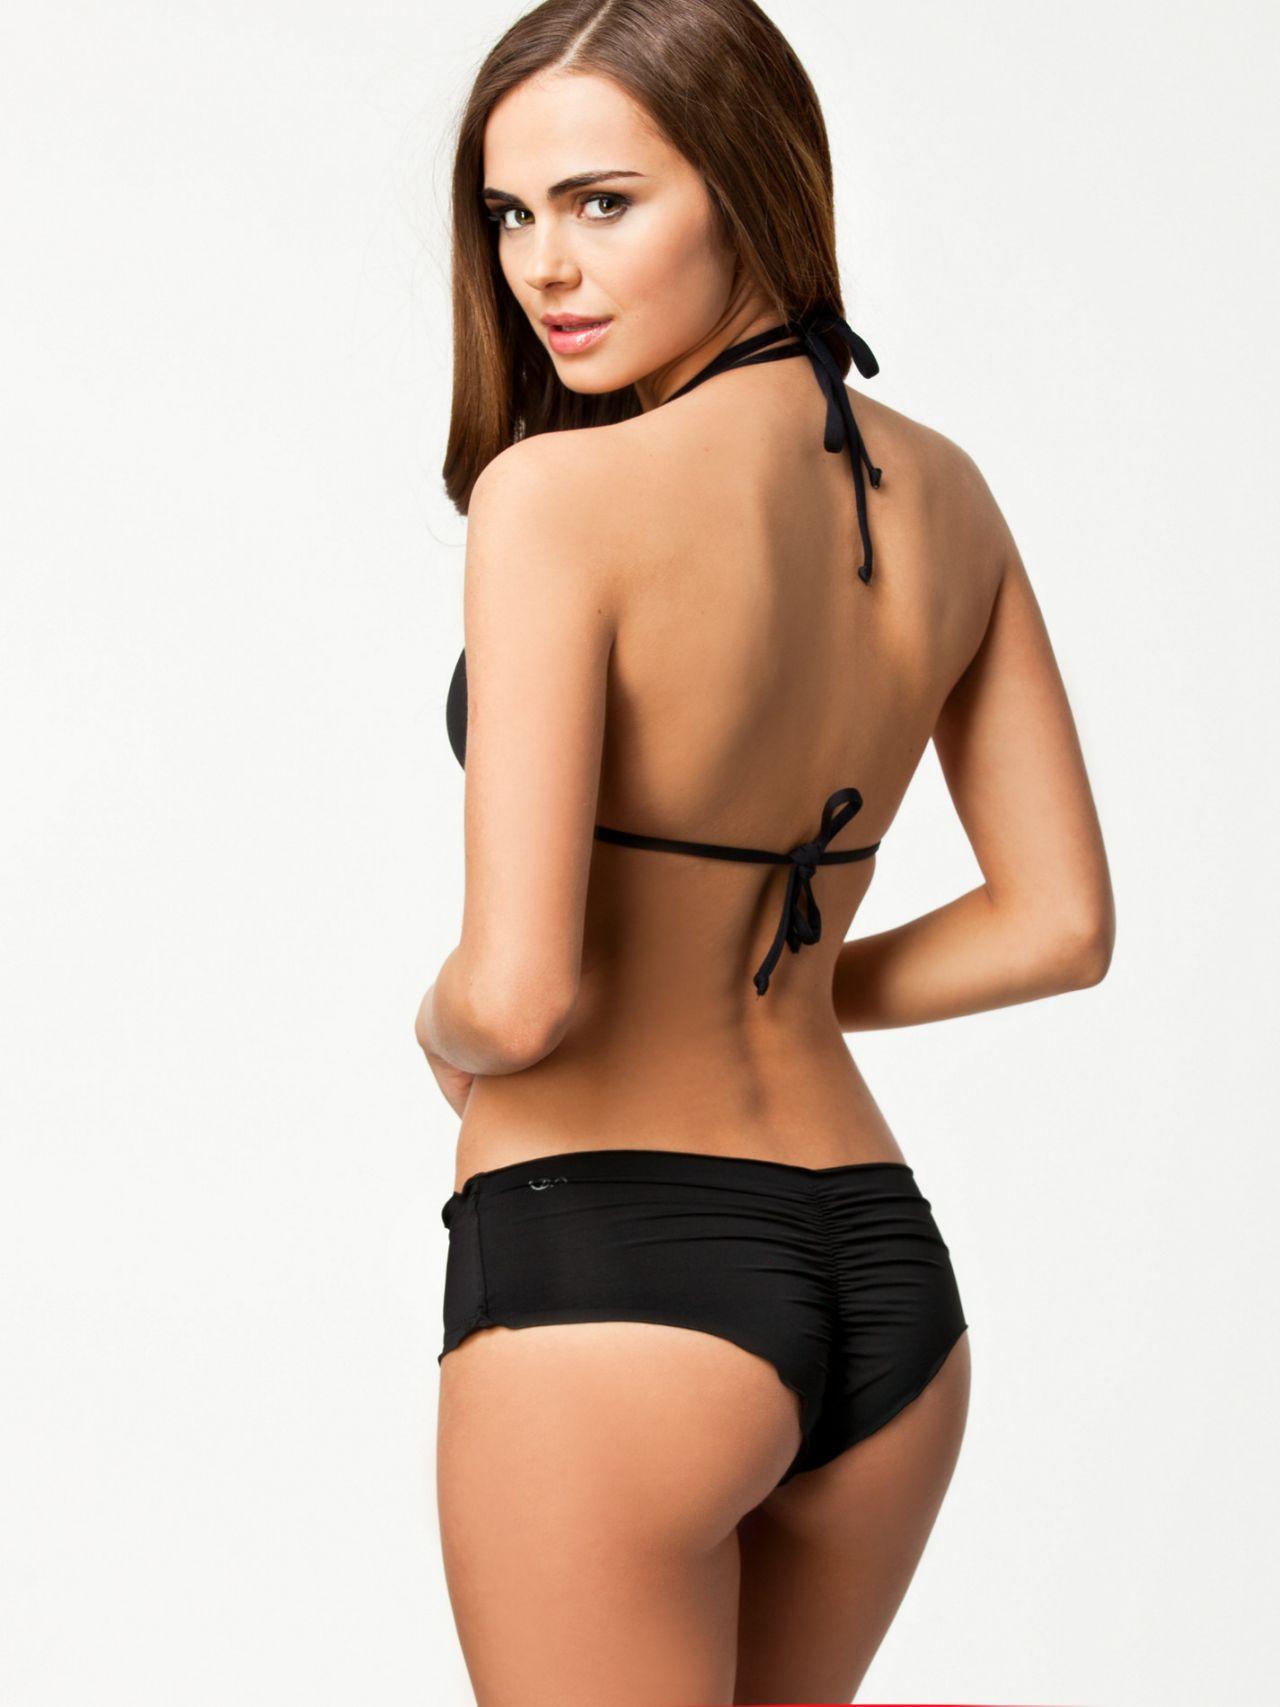 Xenia Deli Bikini Photos - Nelly Swimwear 2013